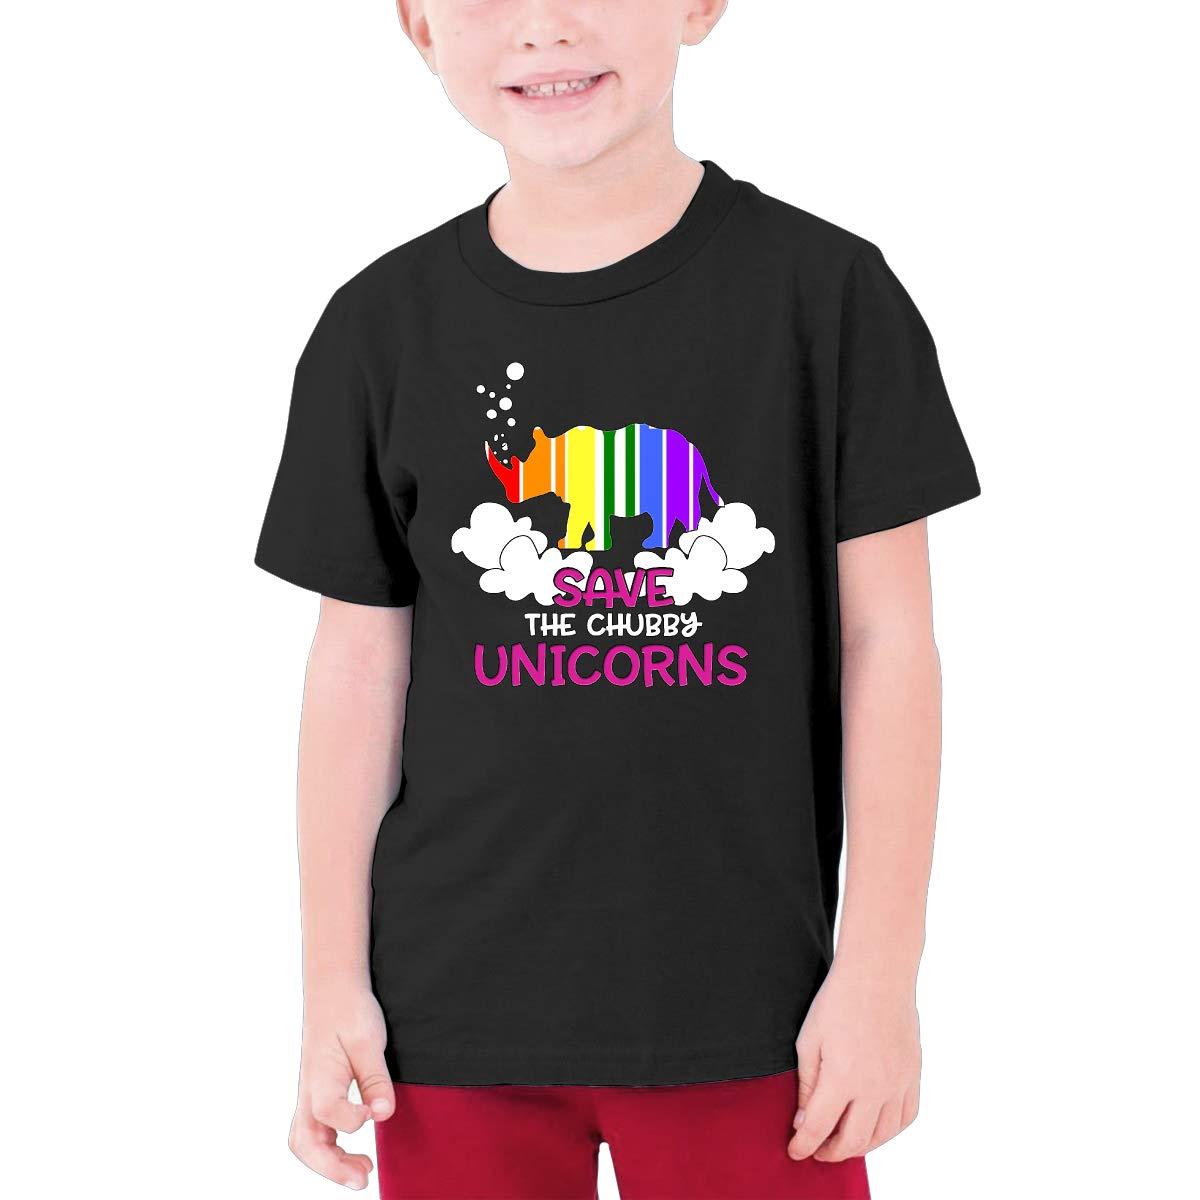 Boys Save The Chubby Unicorns Round Neck Short Sleeve T Shirt Youth Gifts